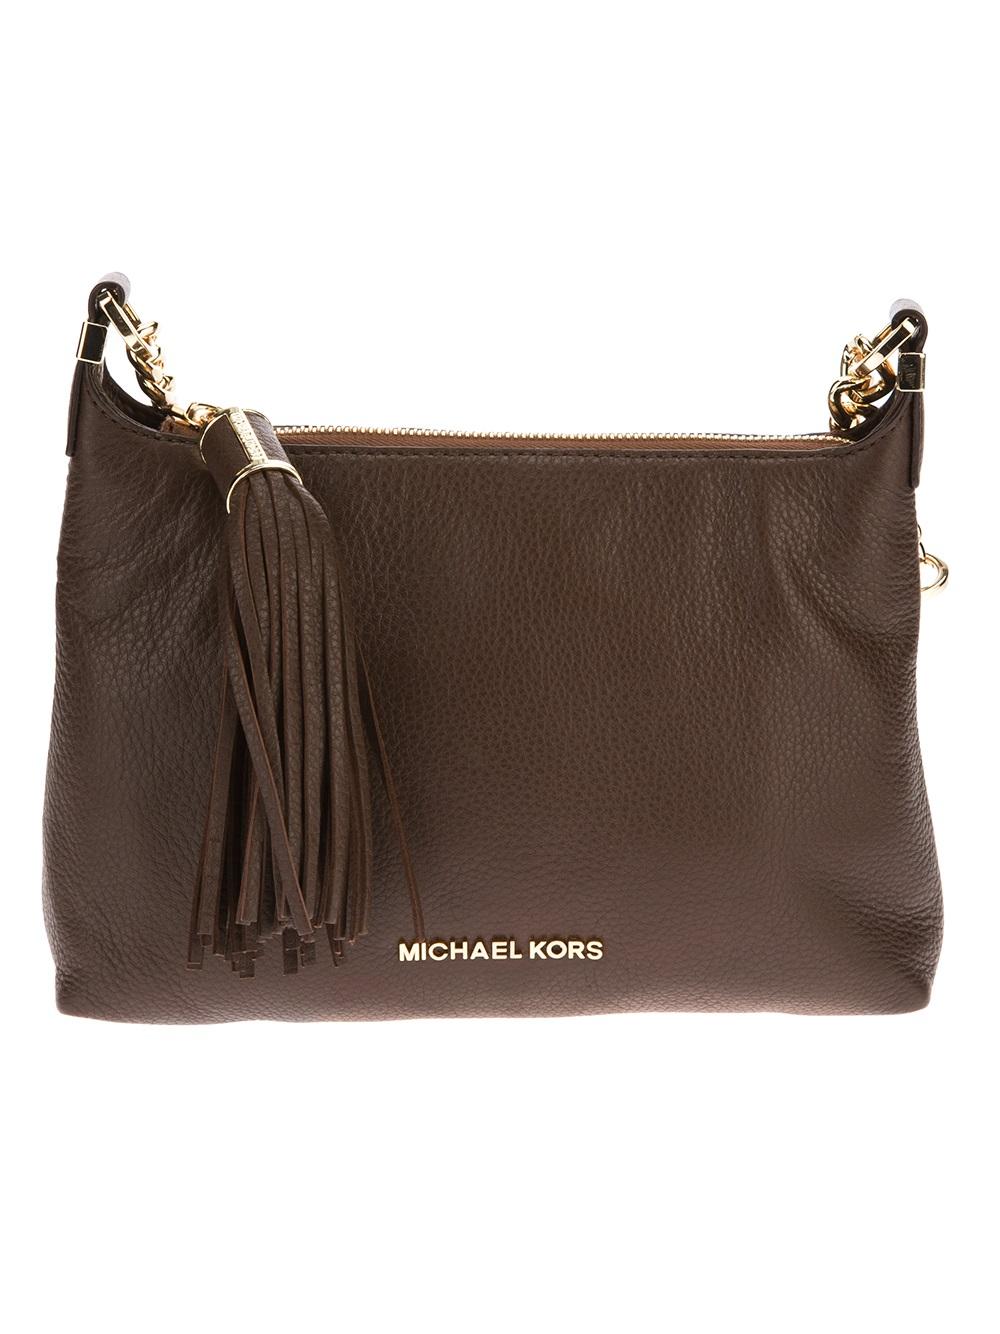 01e9b809d6e976 Michael Kors Weston Small Messenger Bag in Brown - Lyst